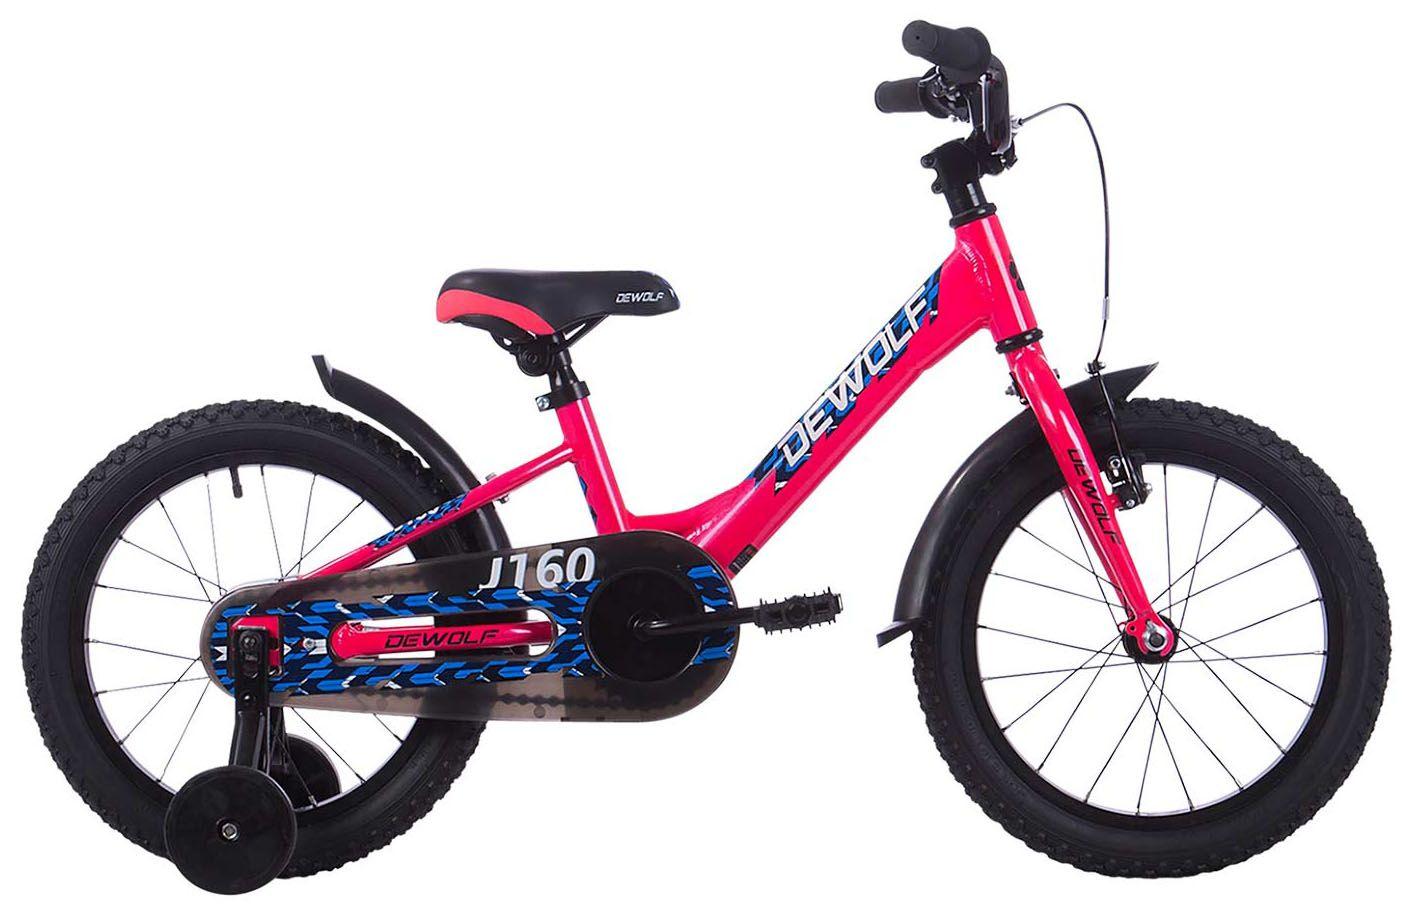 Велосипед Dewolf J160 Girl 2018 велосипед dewolf clk 900 2017